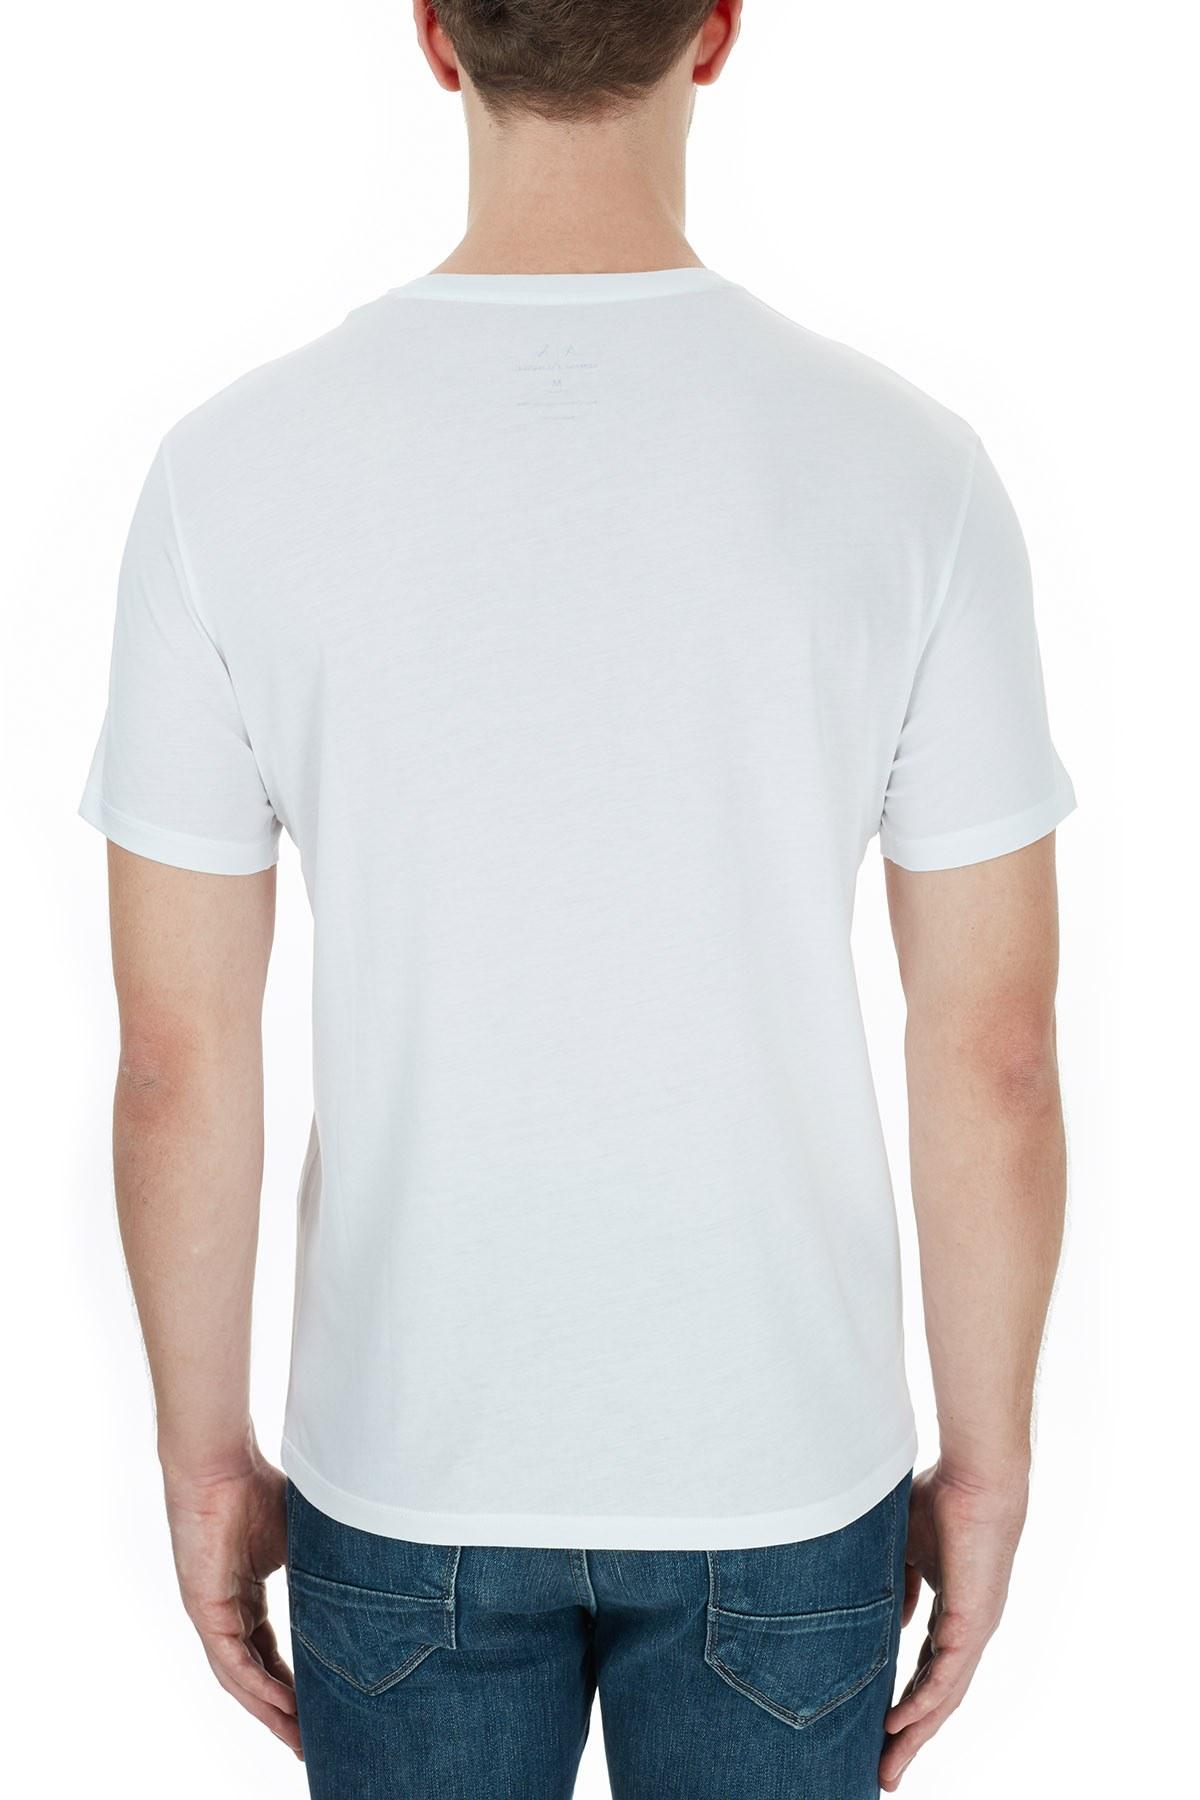 Armani Exchange % 100 Pamuklu Baskılı Bisiklet Yaka Erkek T Shirt 6HZTAD ZJA5Z 1100 BEYAZ